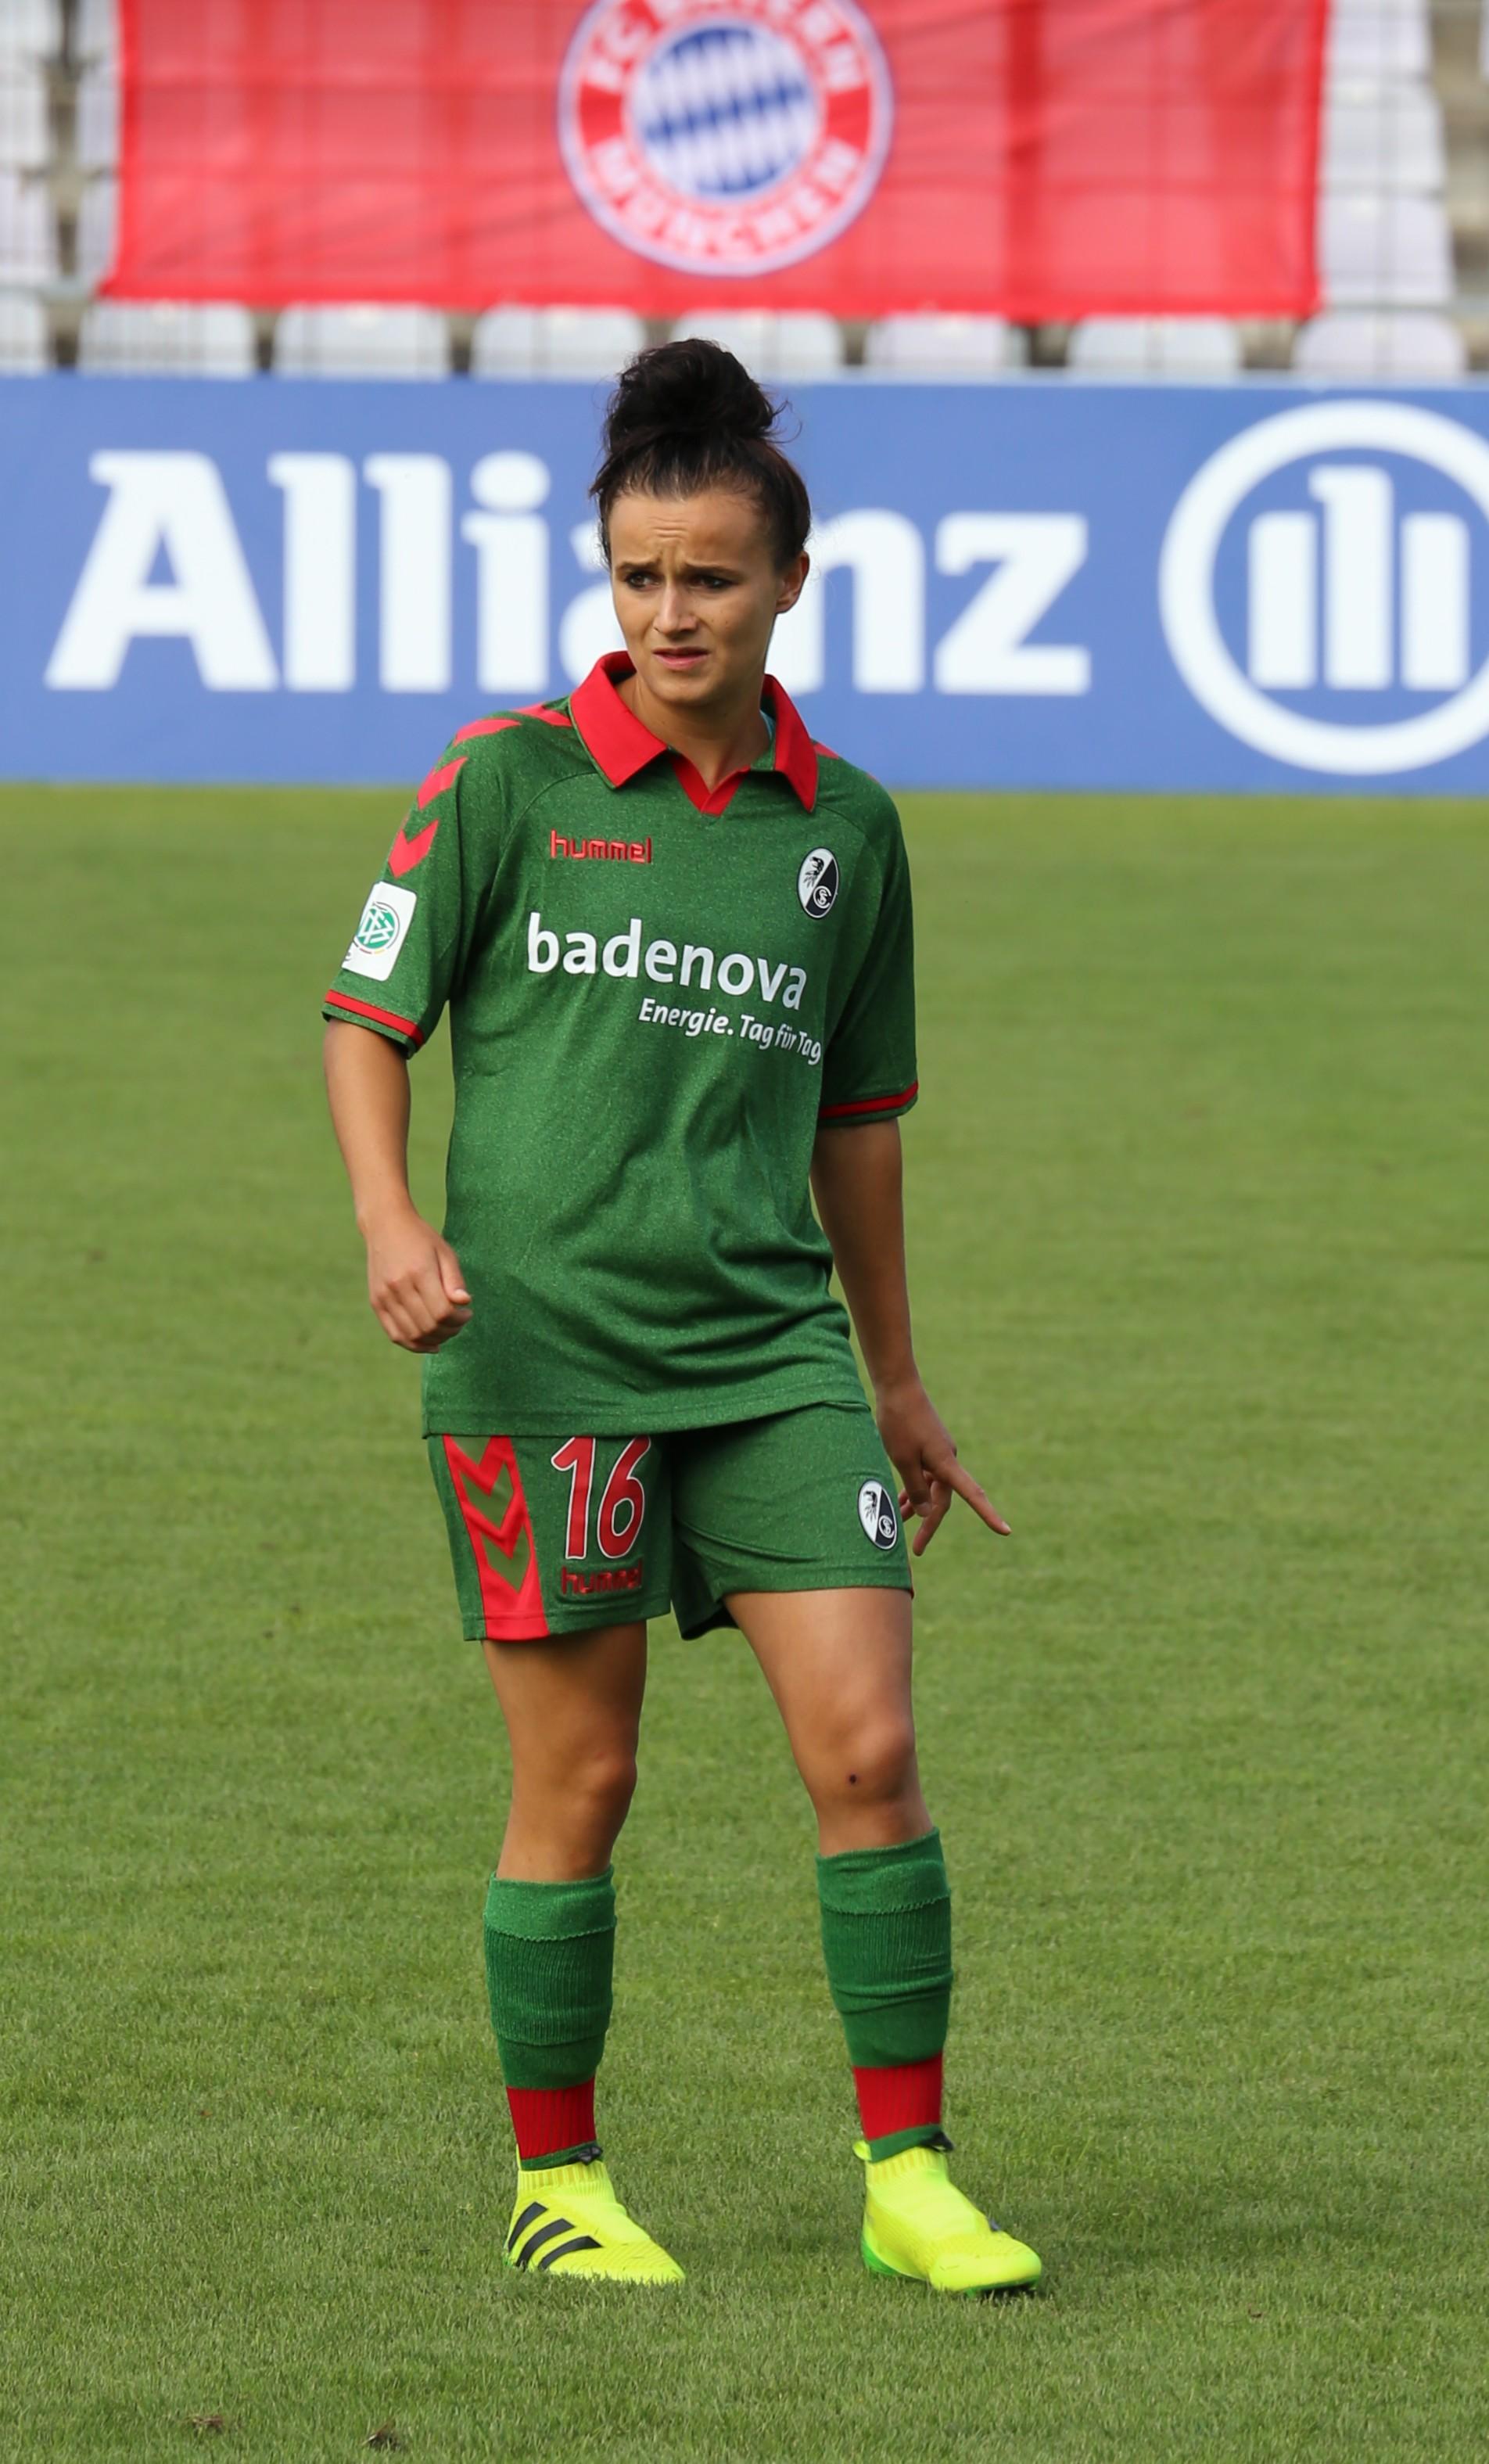 Lina Magull